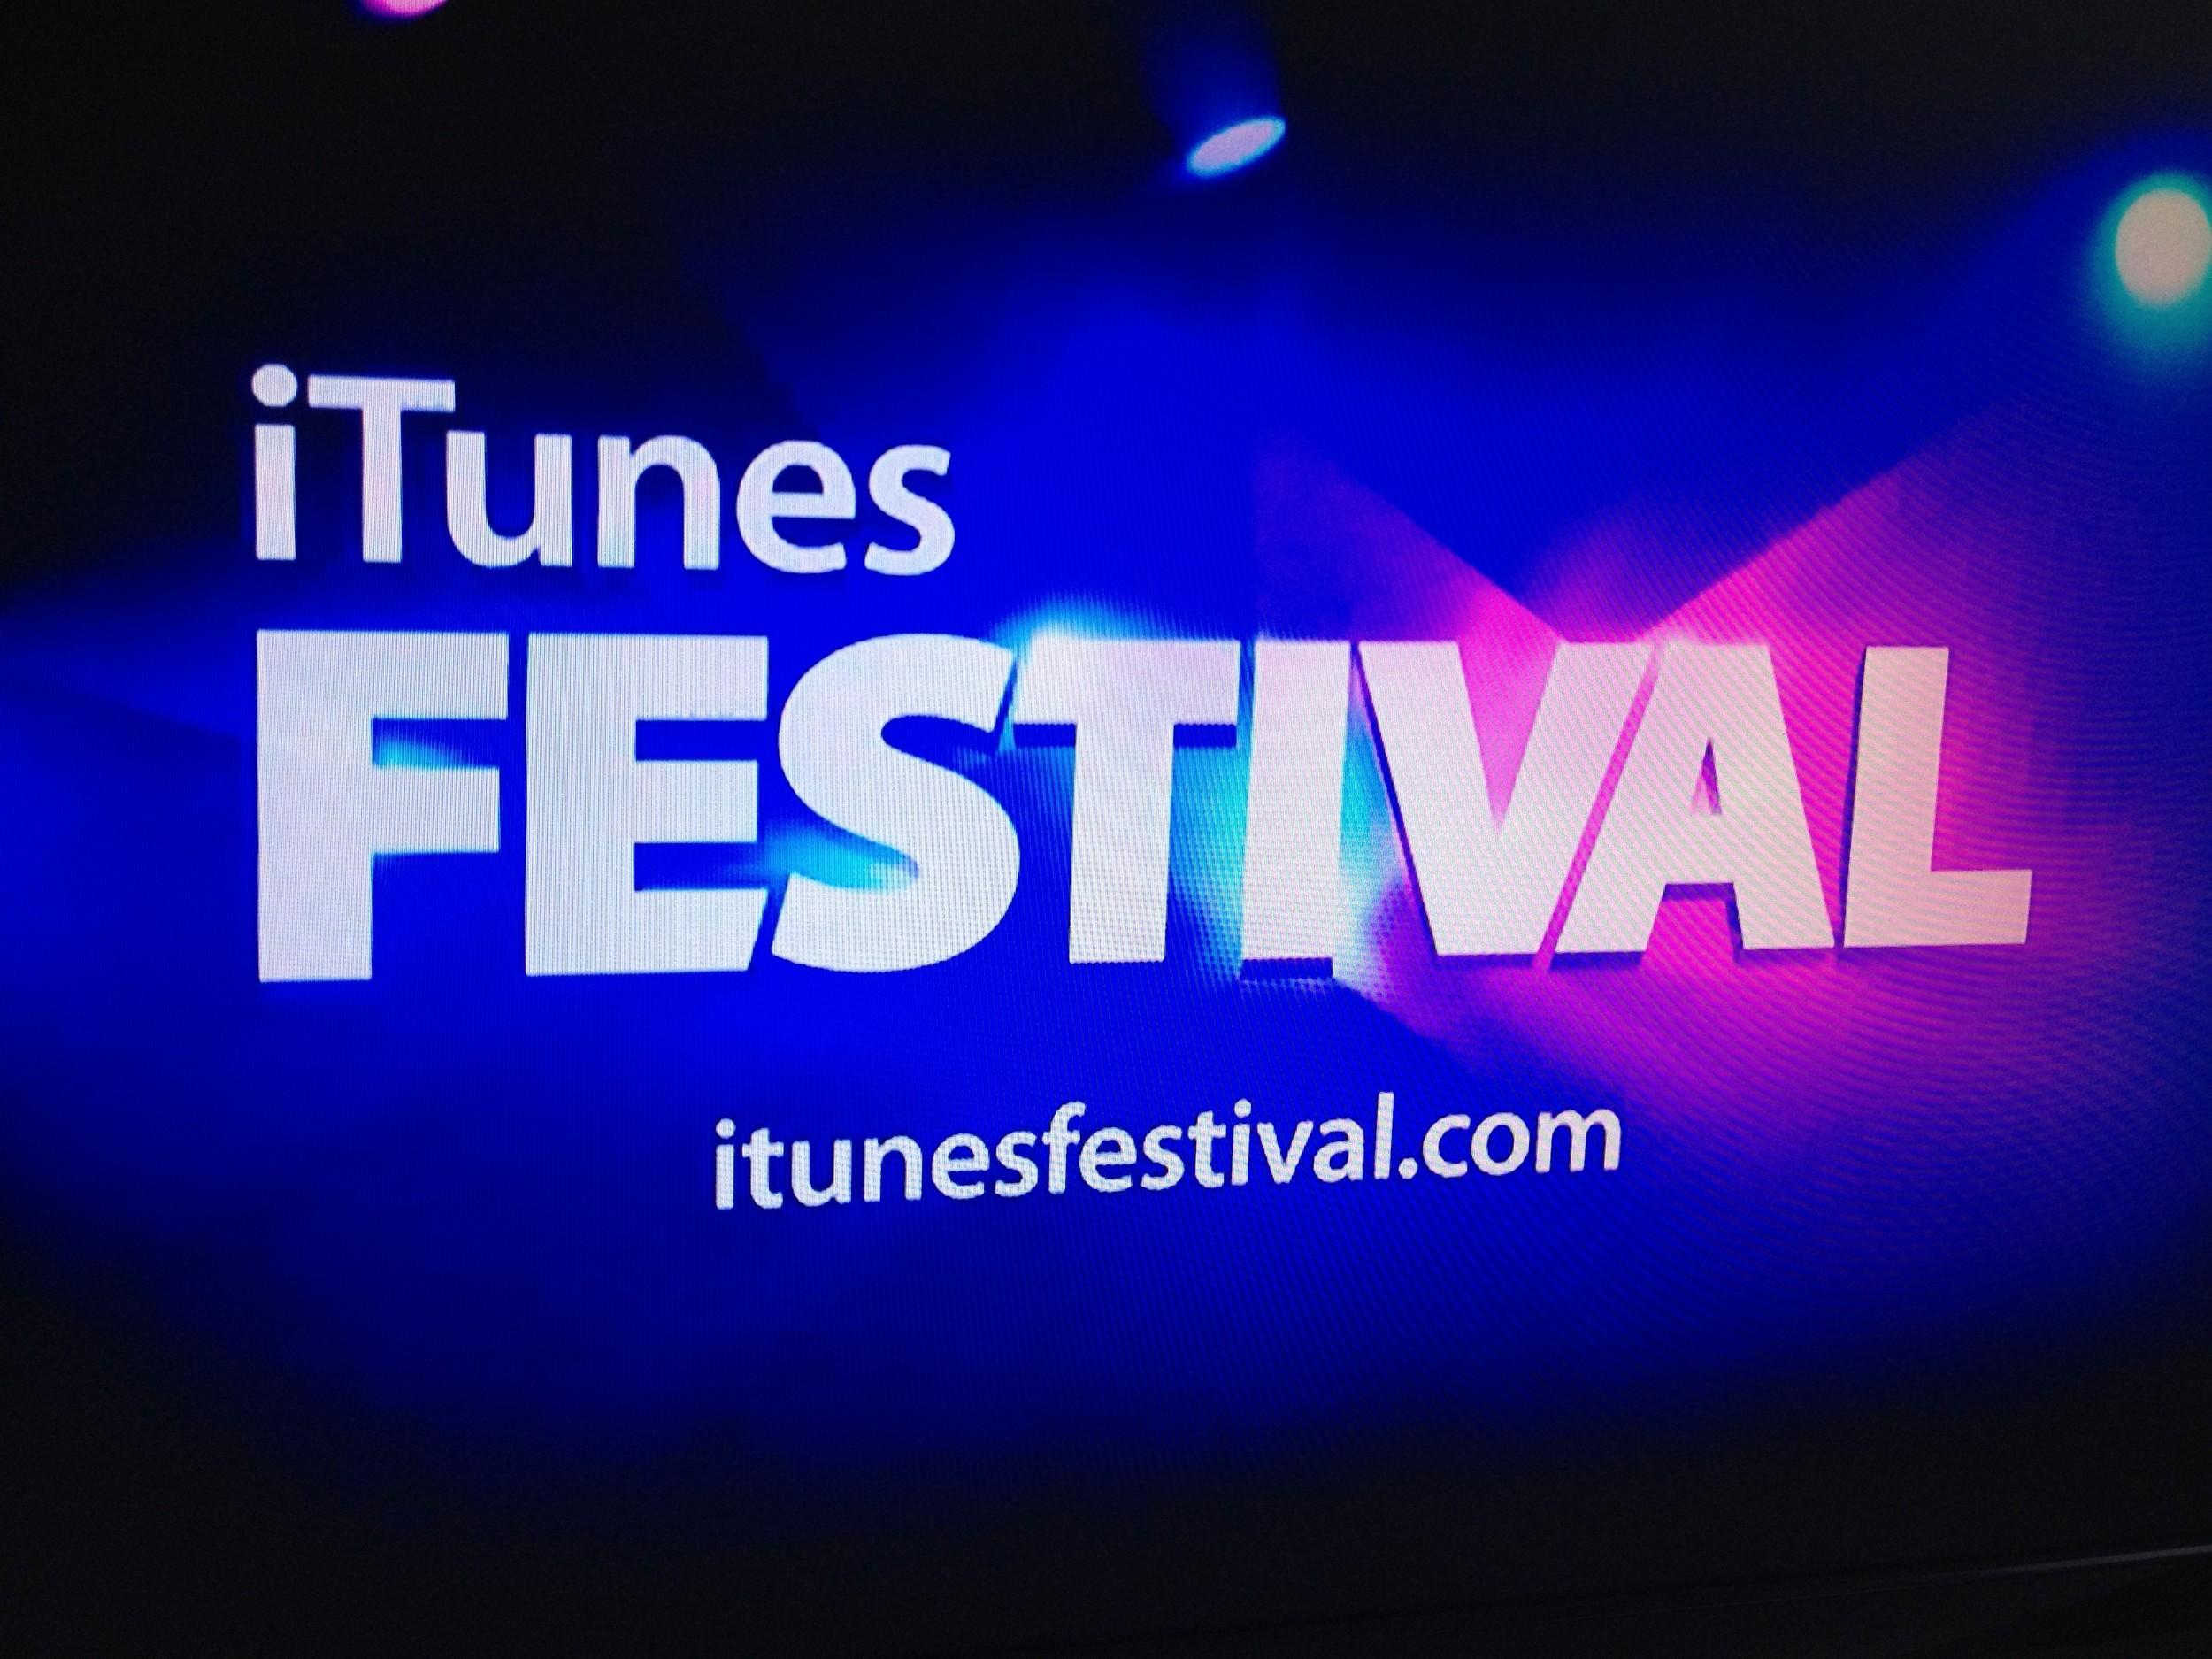 iTunes Festival 2012 Apple TV Screen Grab 01